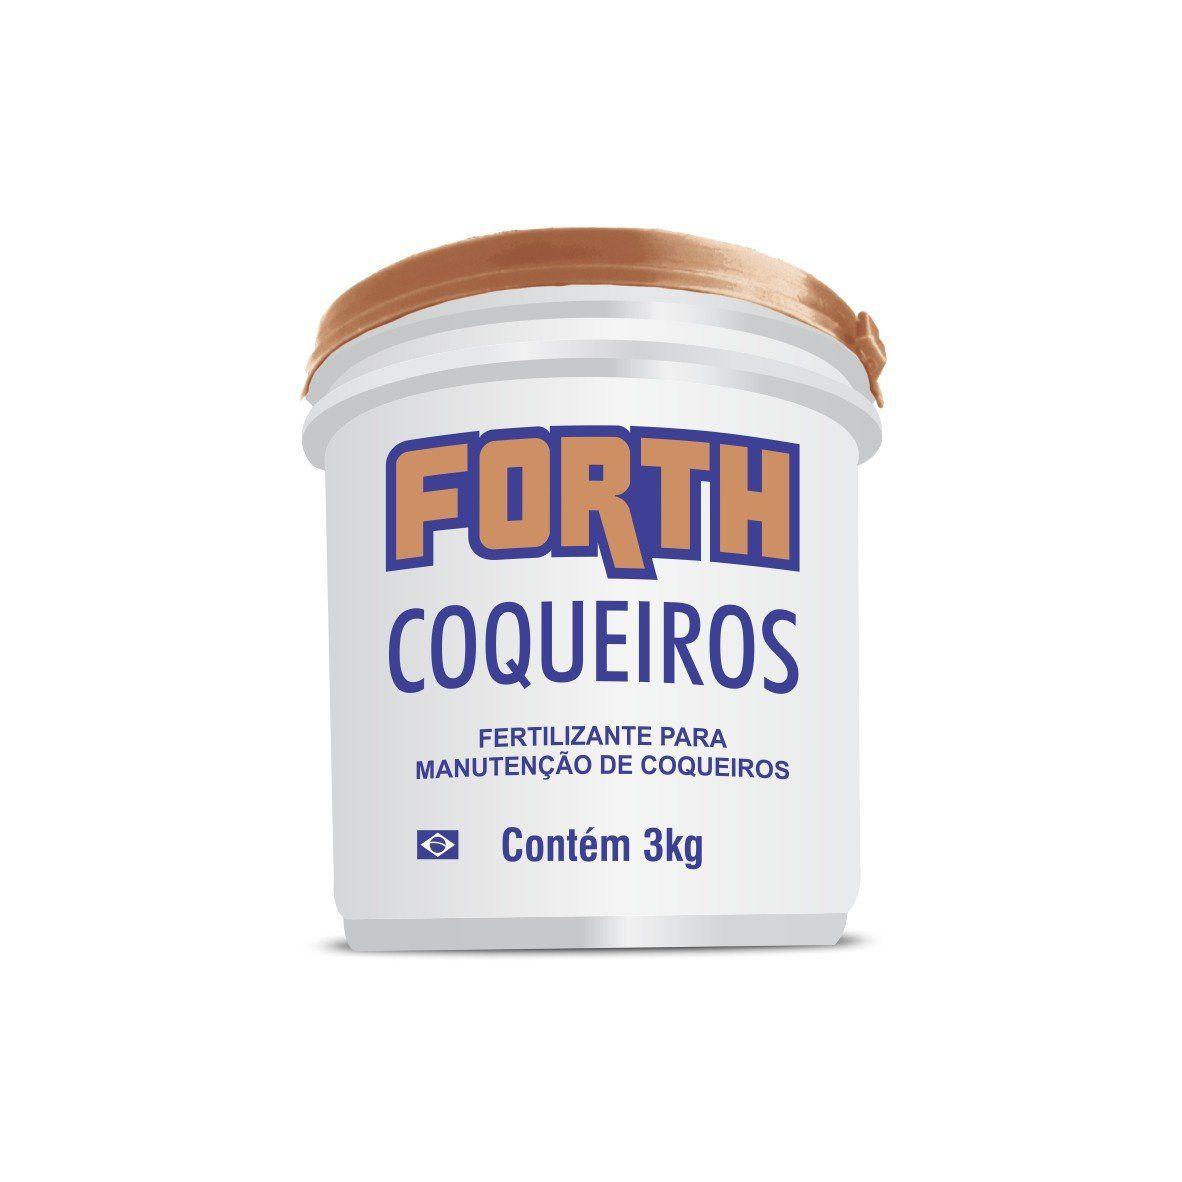 Adubo Fertilizante para Coqueiros - FORTH Coqueiros - 3kg